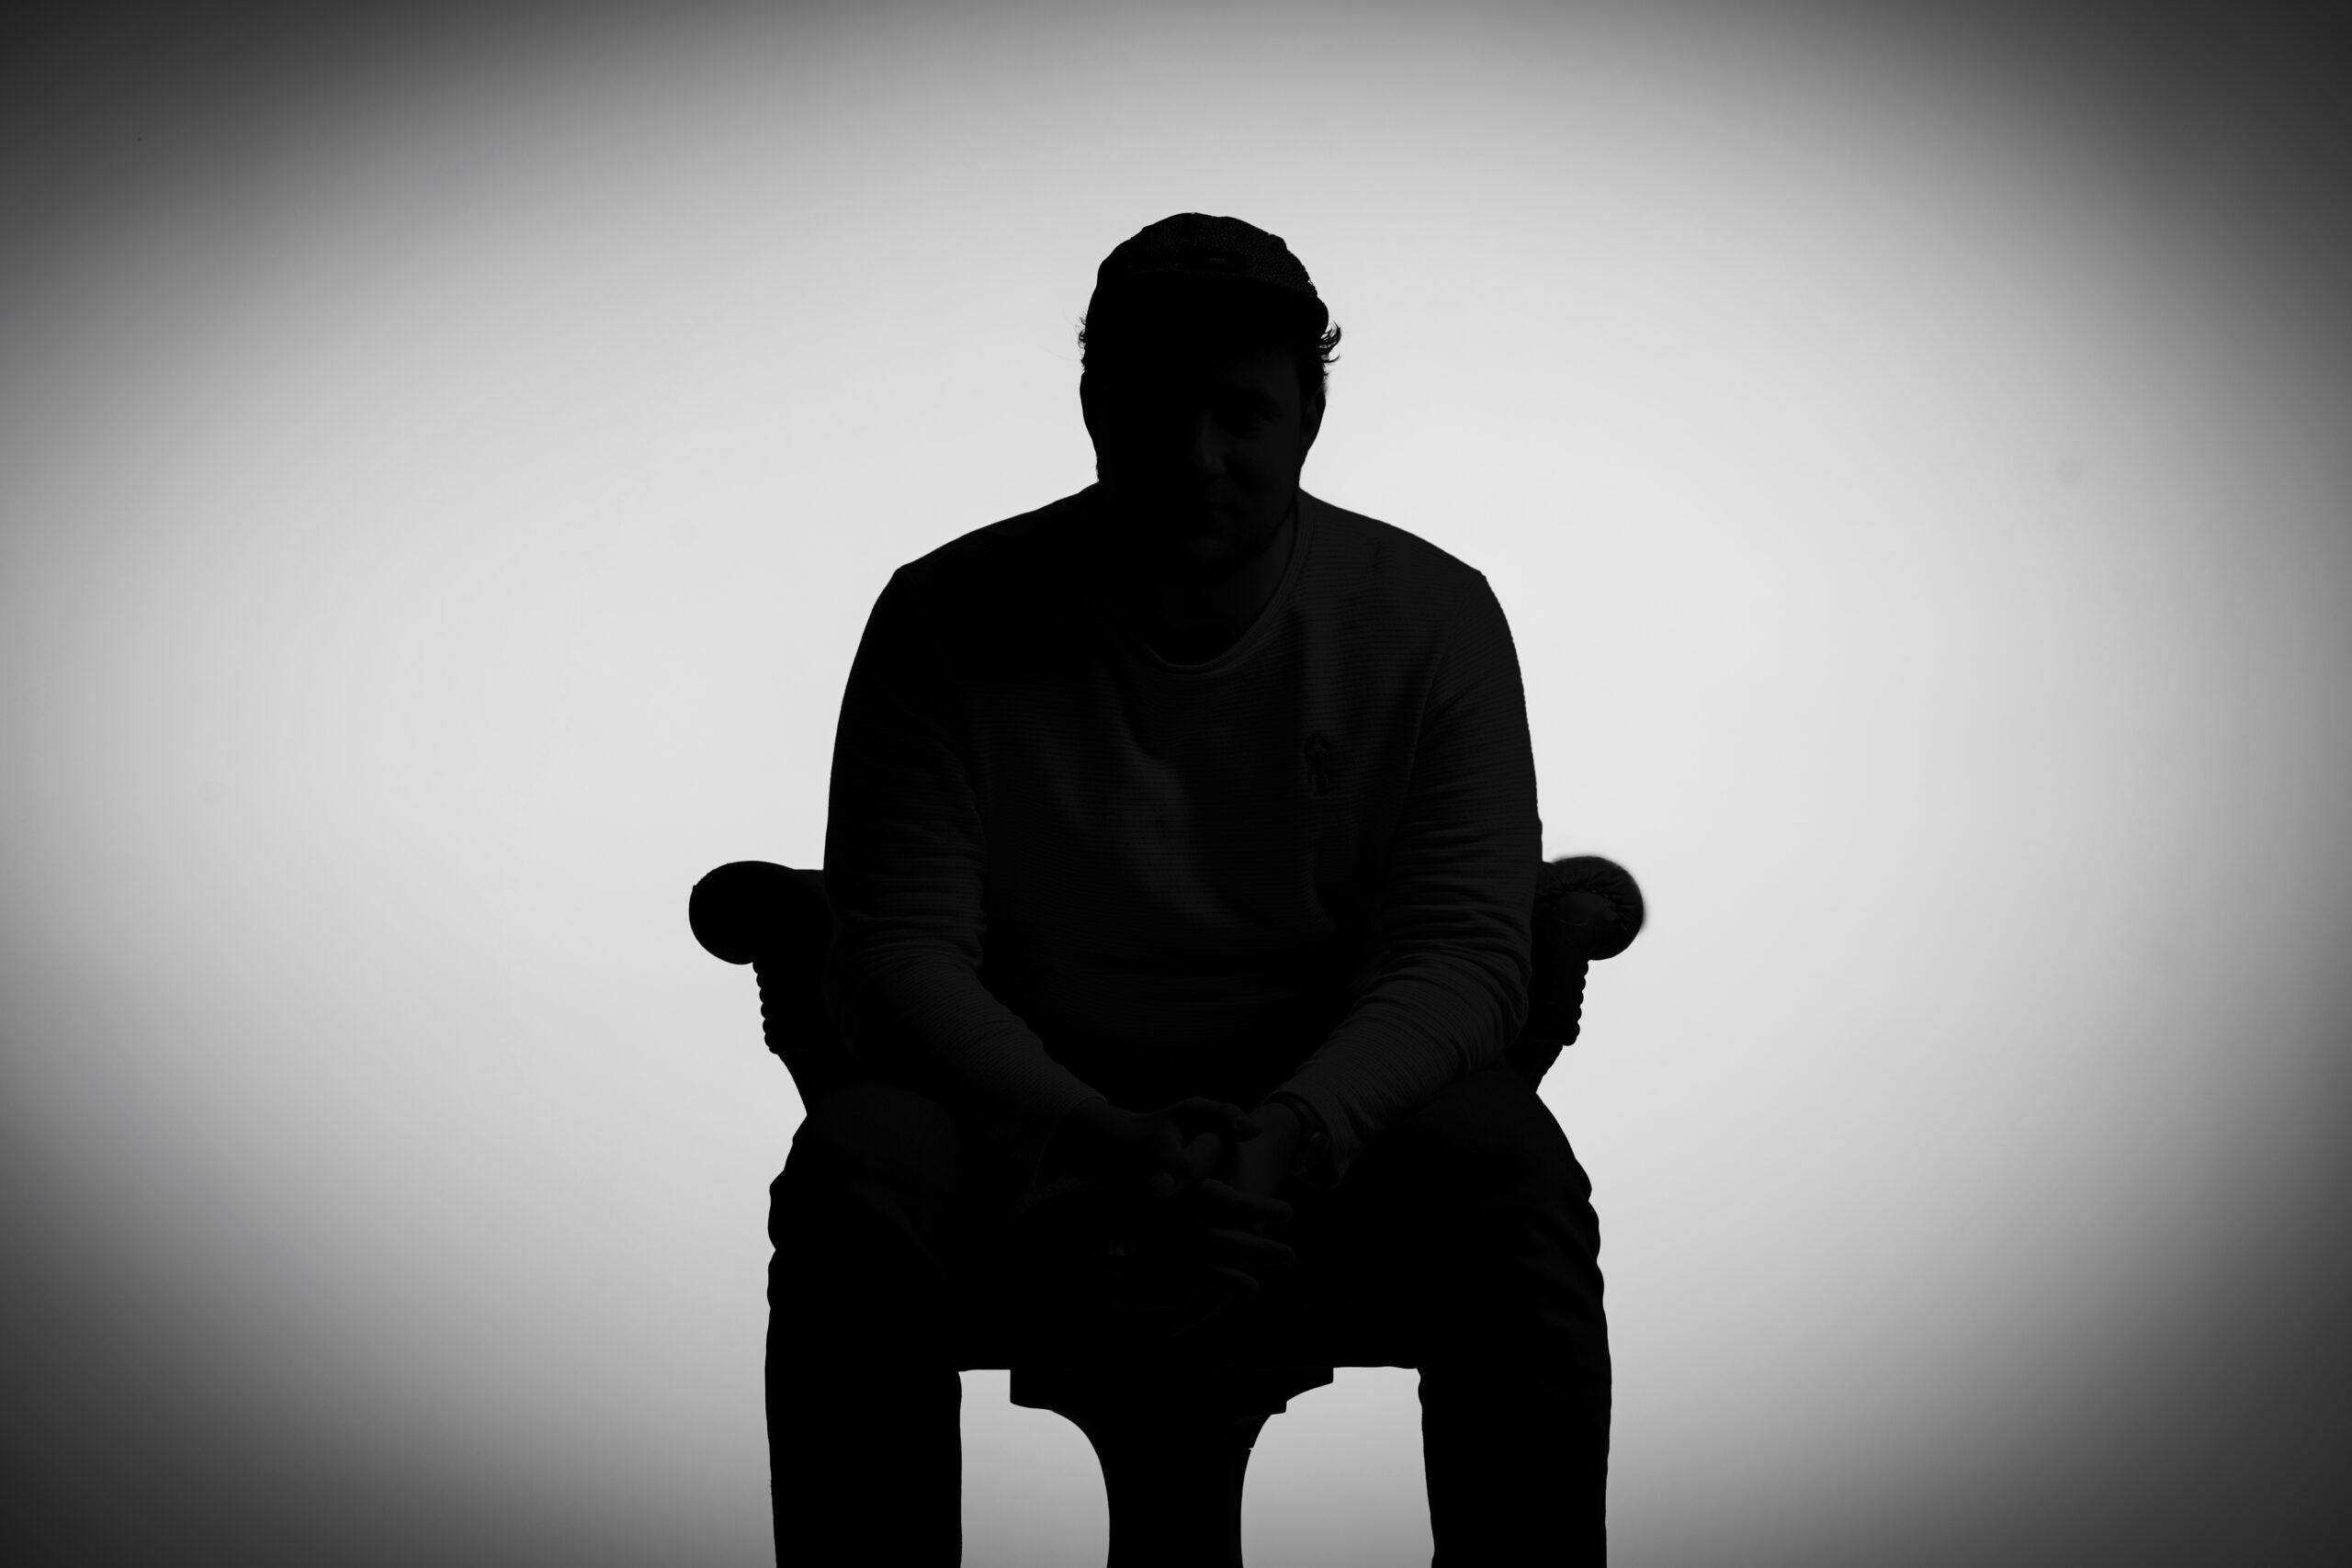 Anonymous human (43, man)